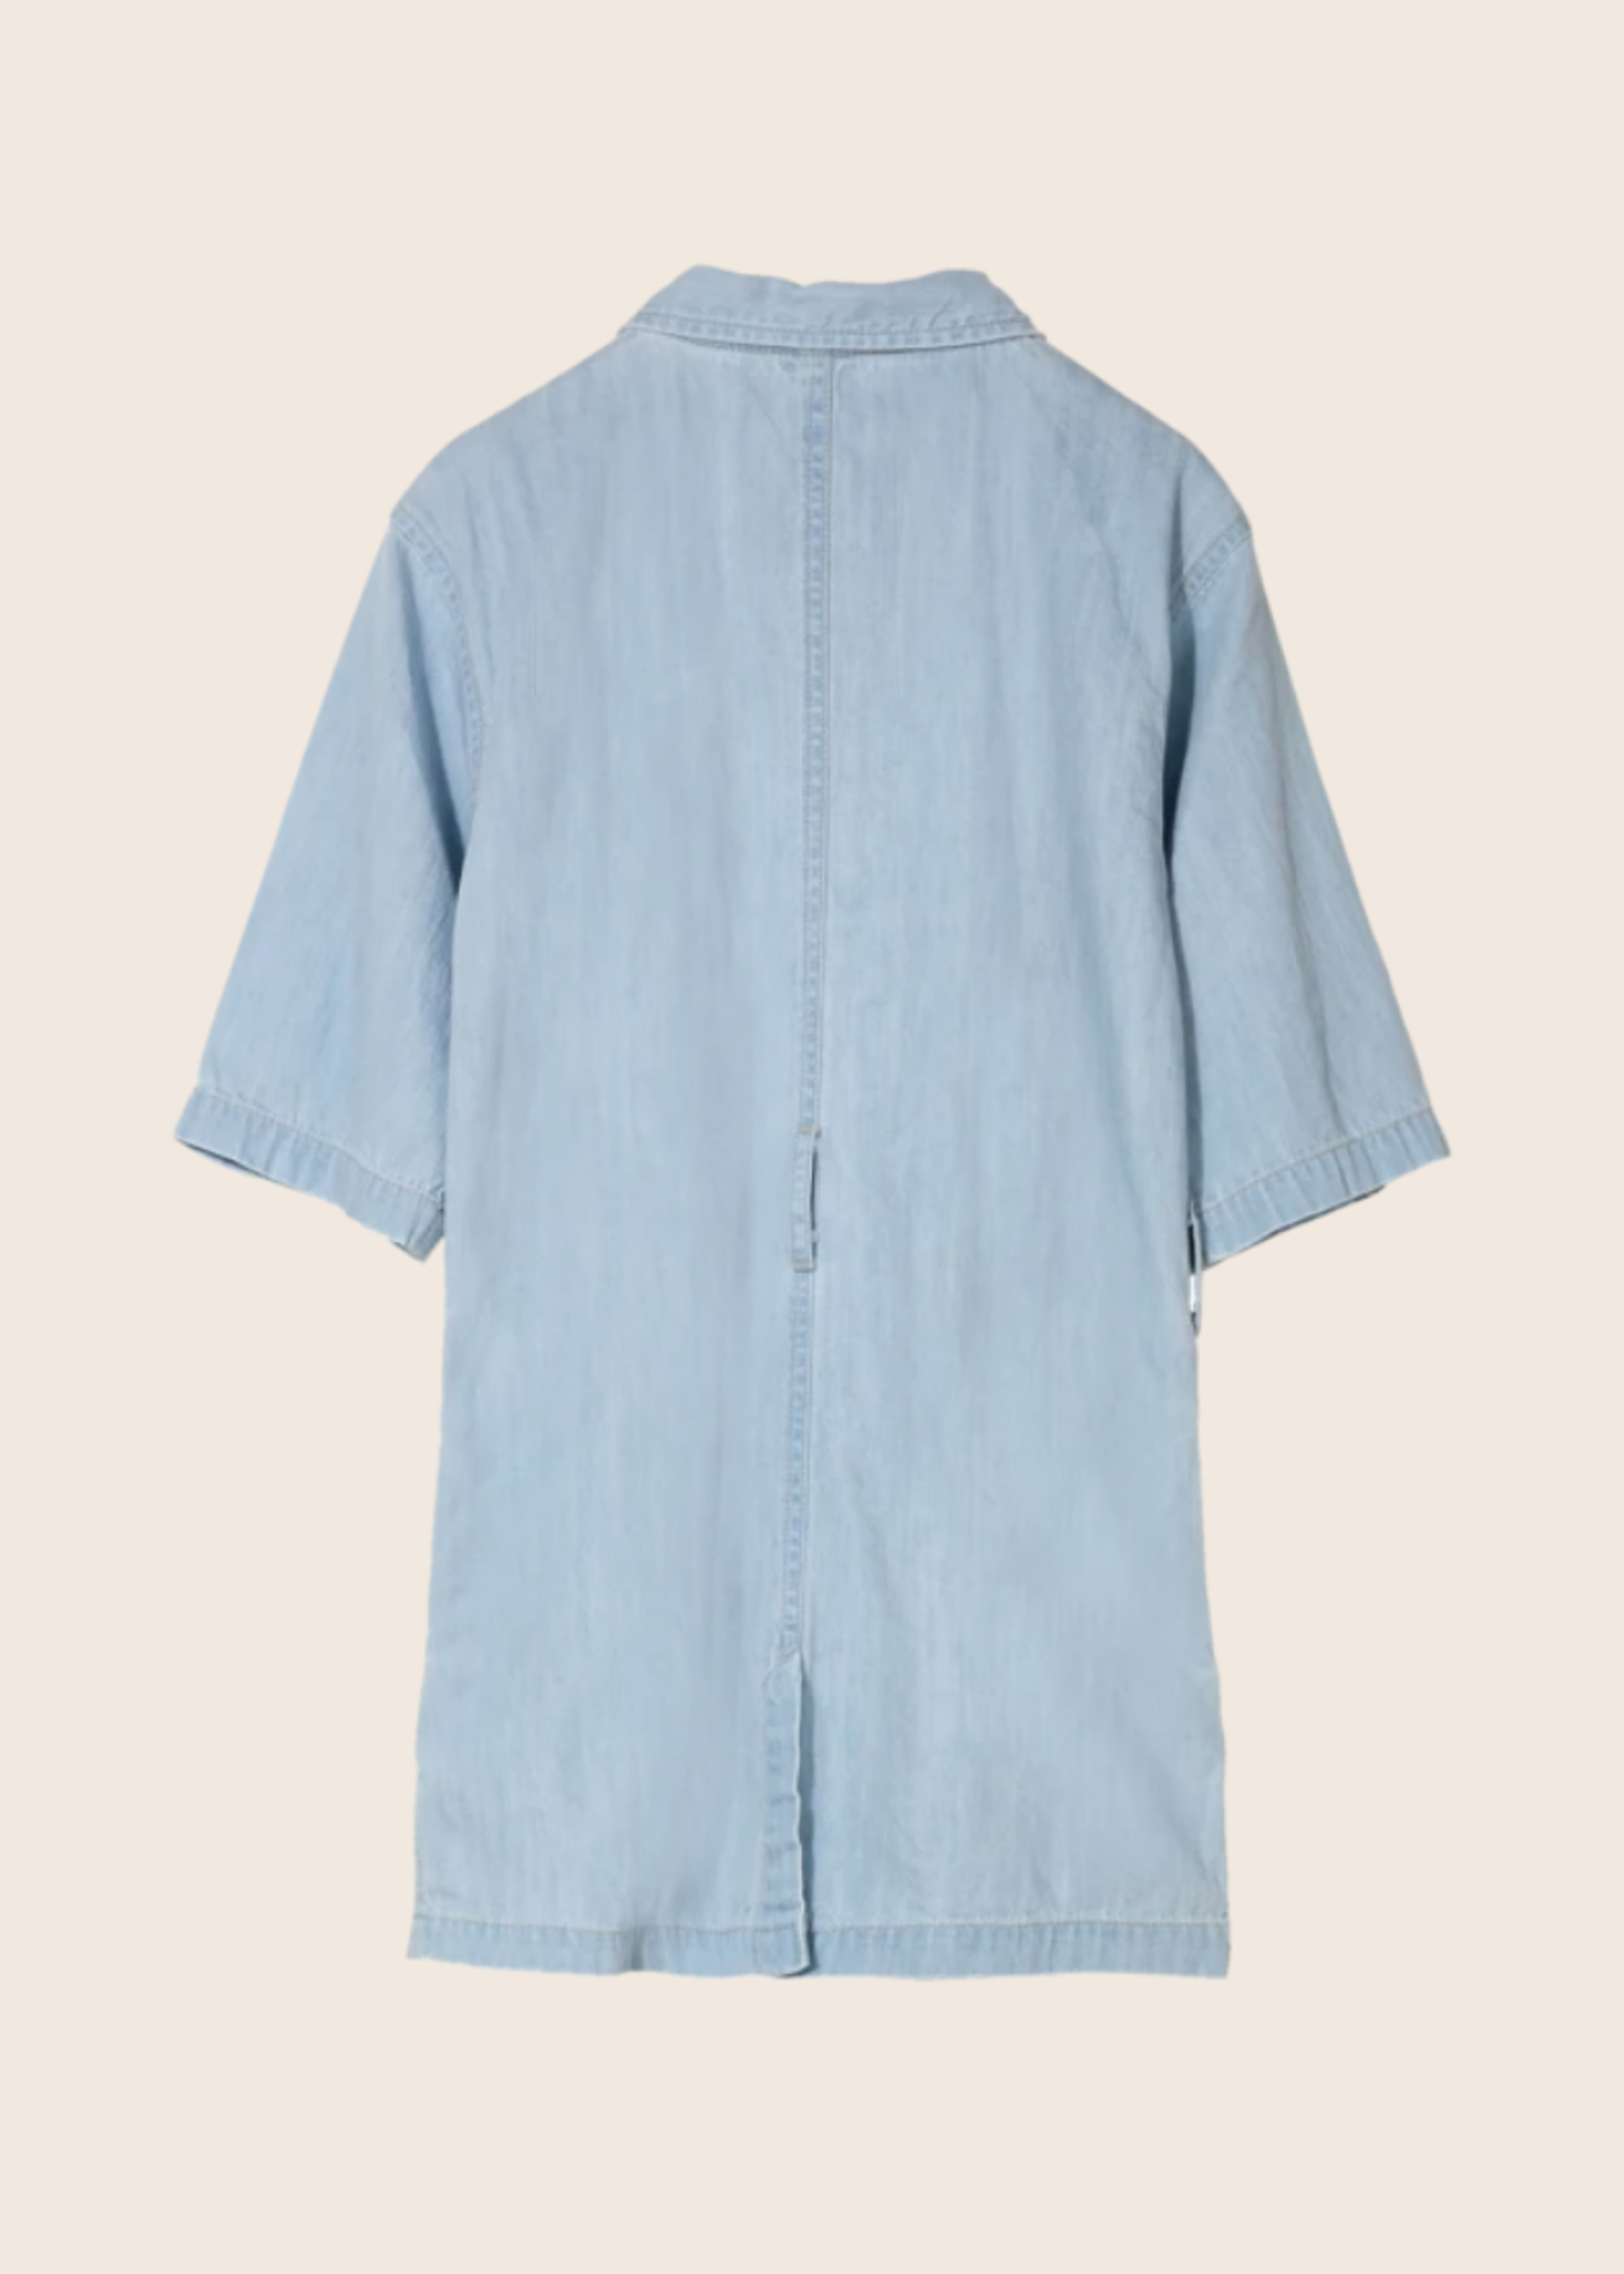 FINGER IN THE NOSE CRESTON Super Bleached Blue - Short Sleeve Dress